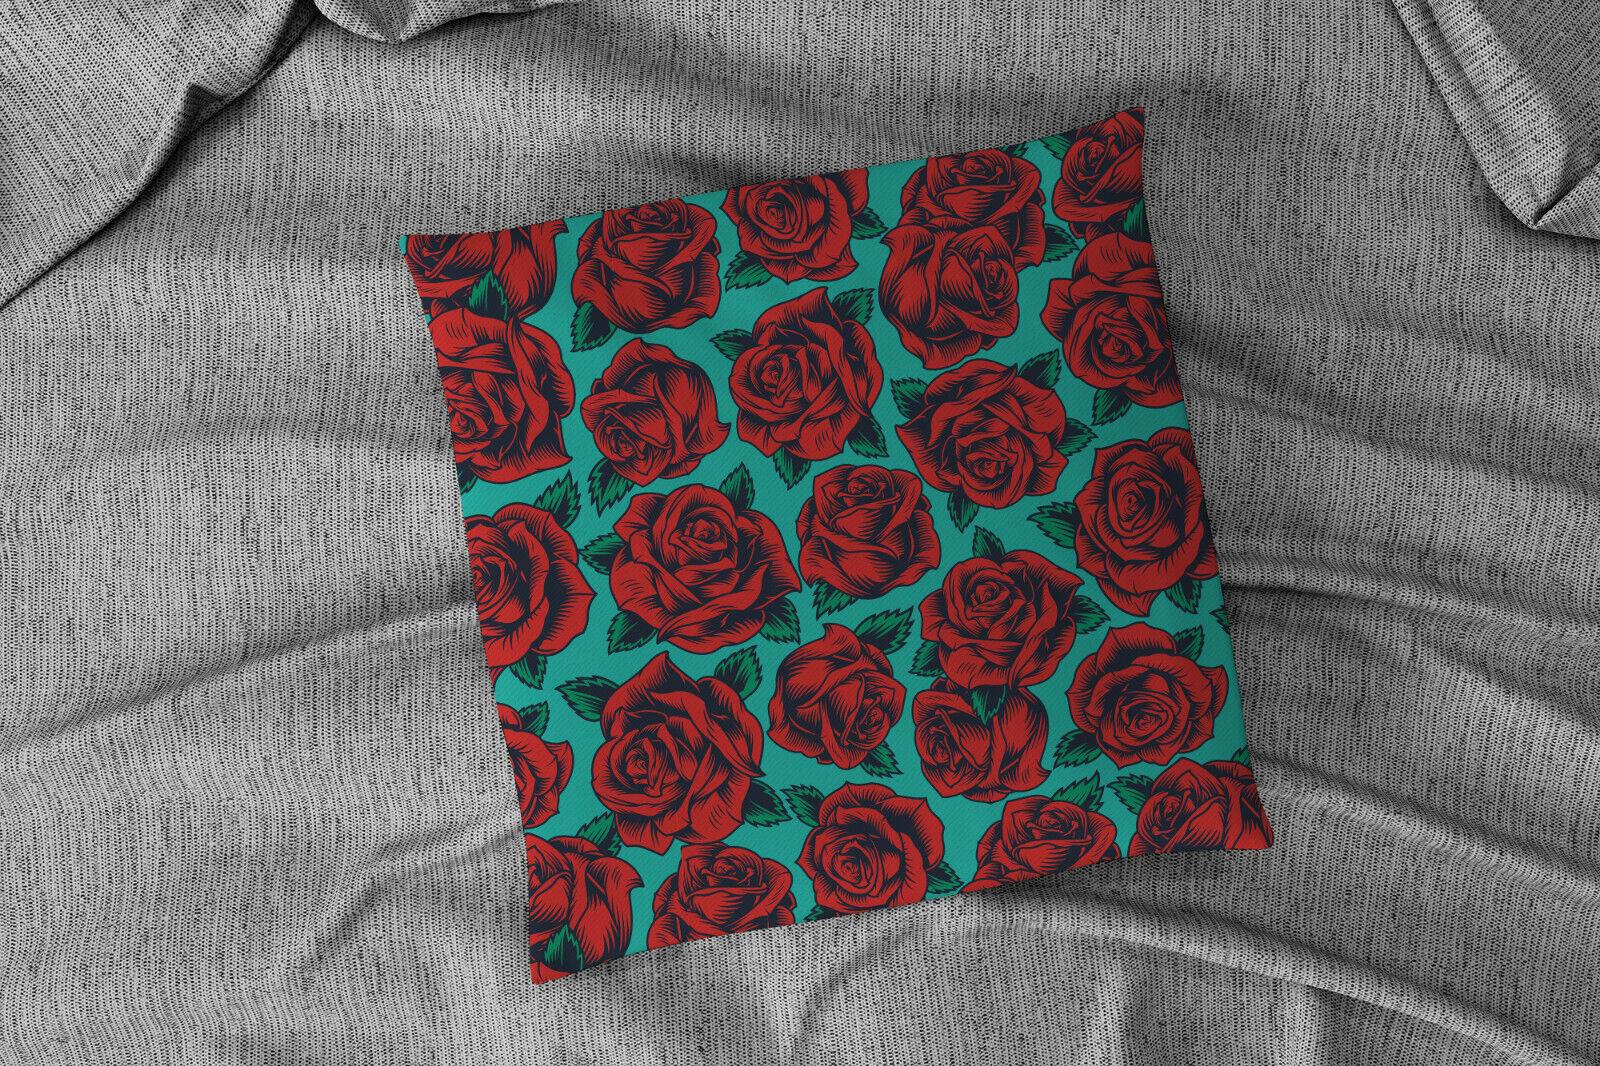 Northern Soul Tissu Rose 21 Variations de Prix par mètre lsfabric 127